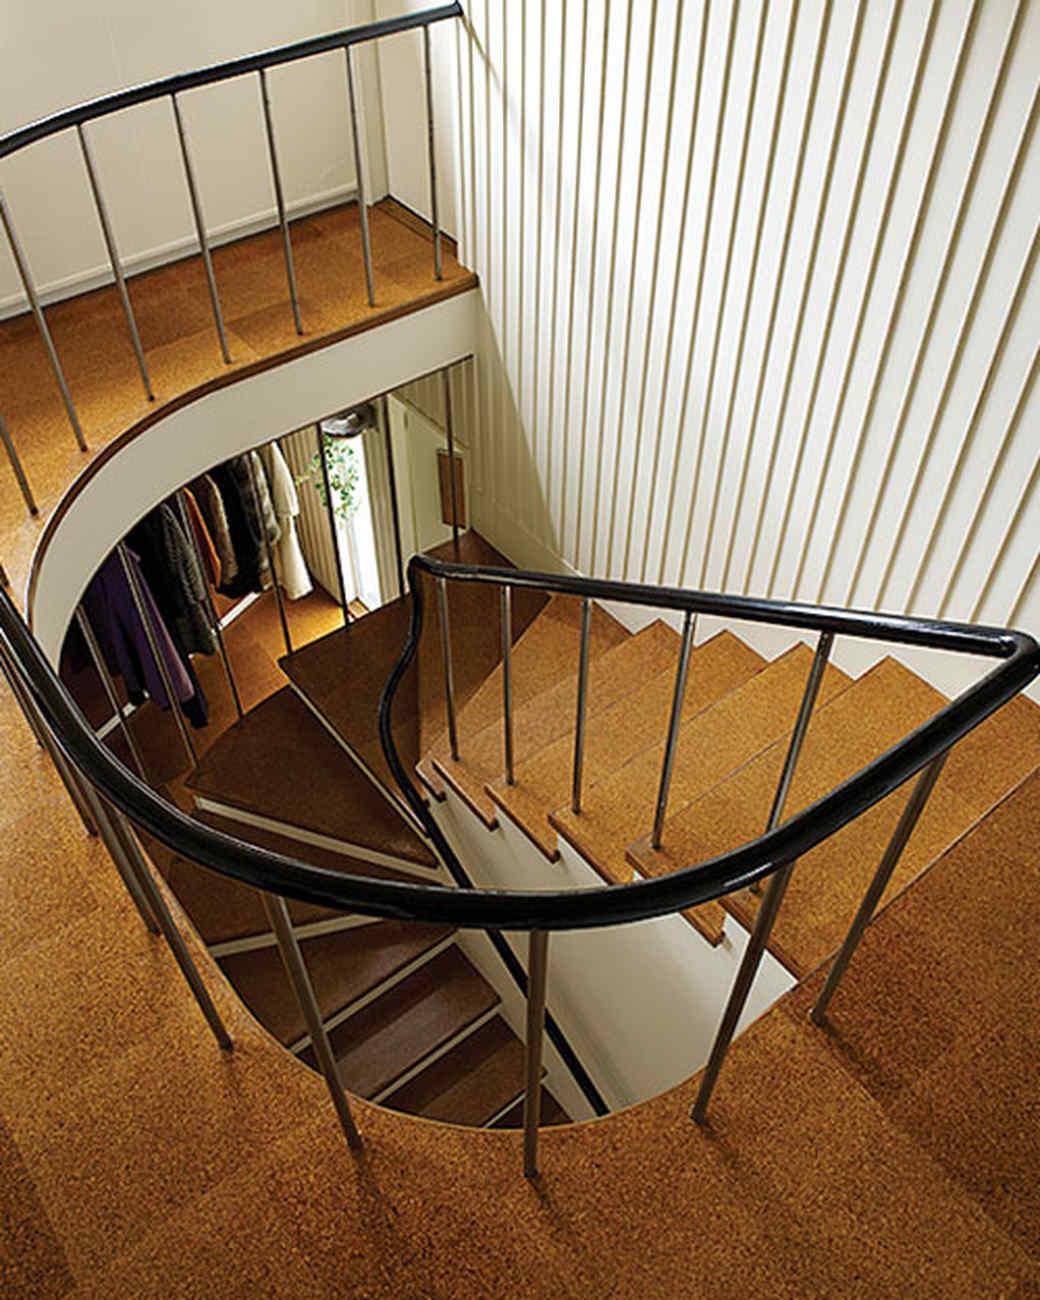 mld104046_sept2008_stair14.jpg